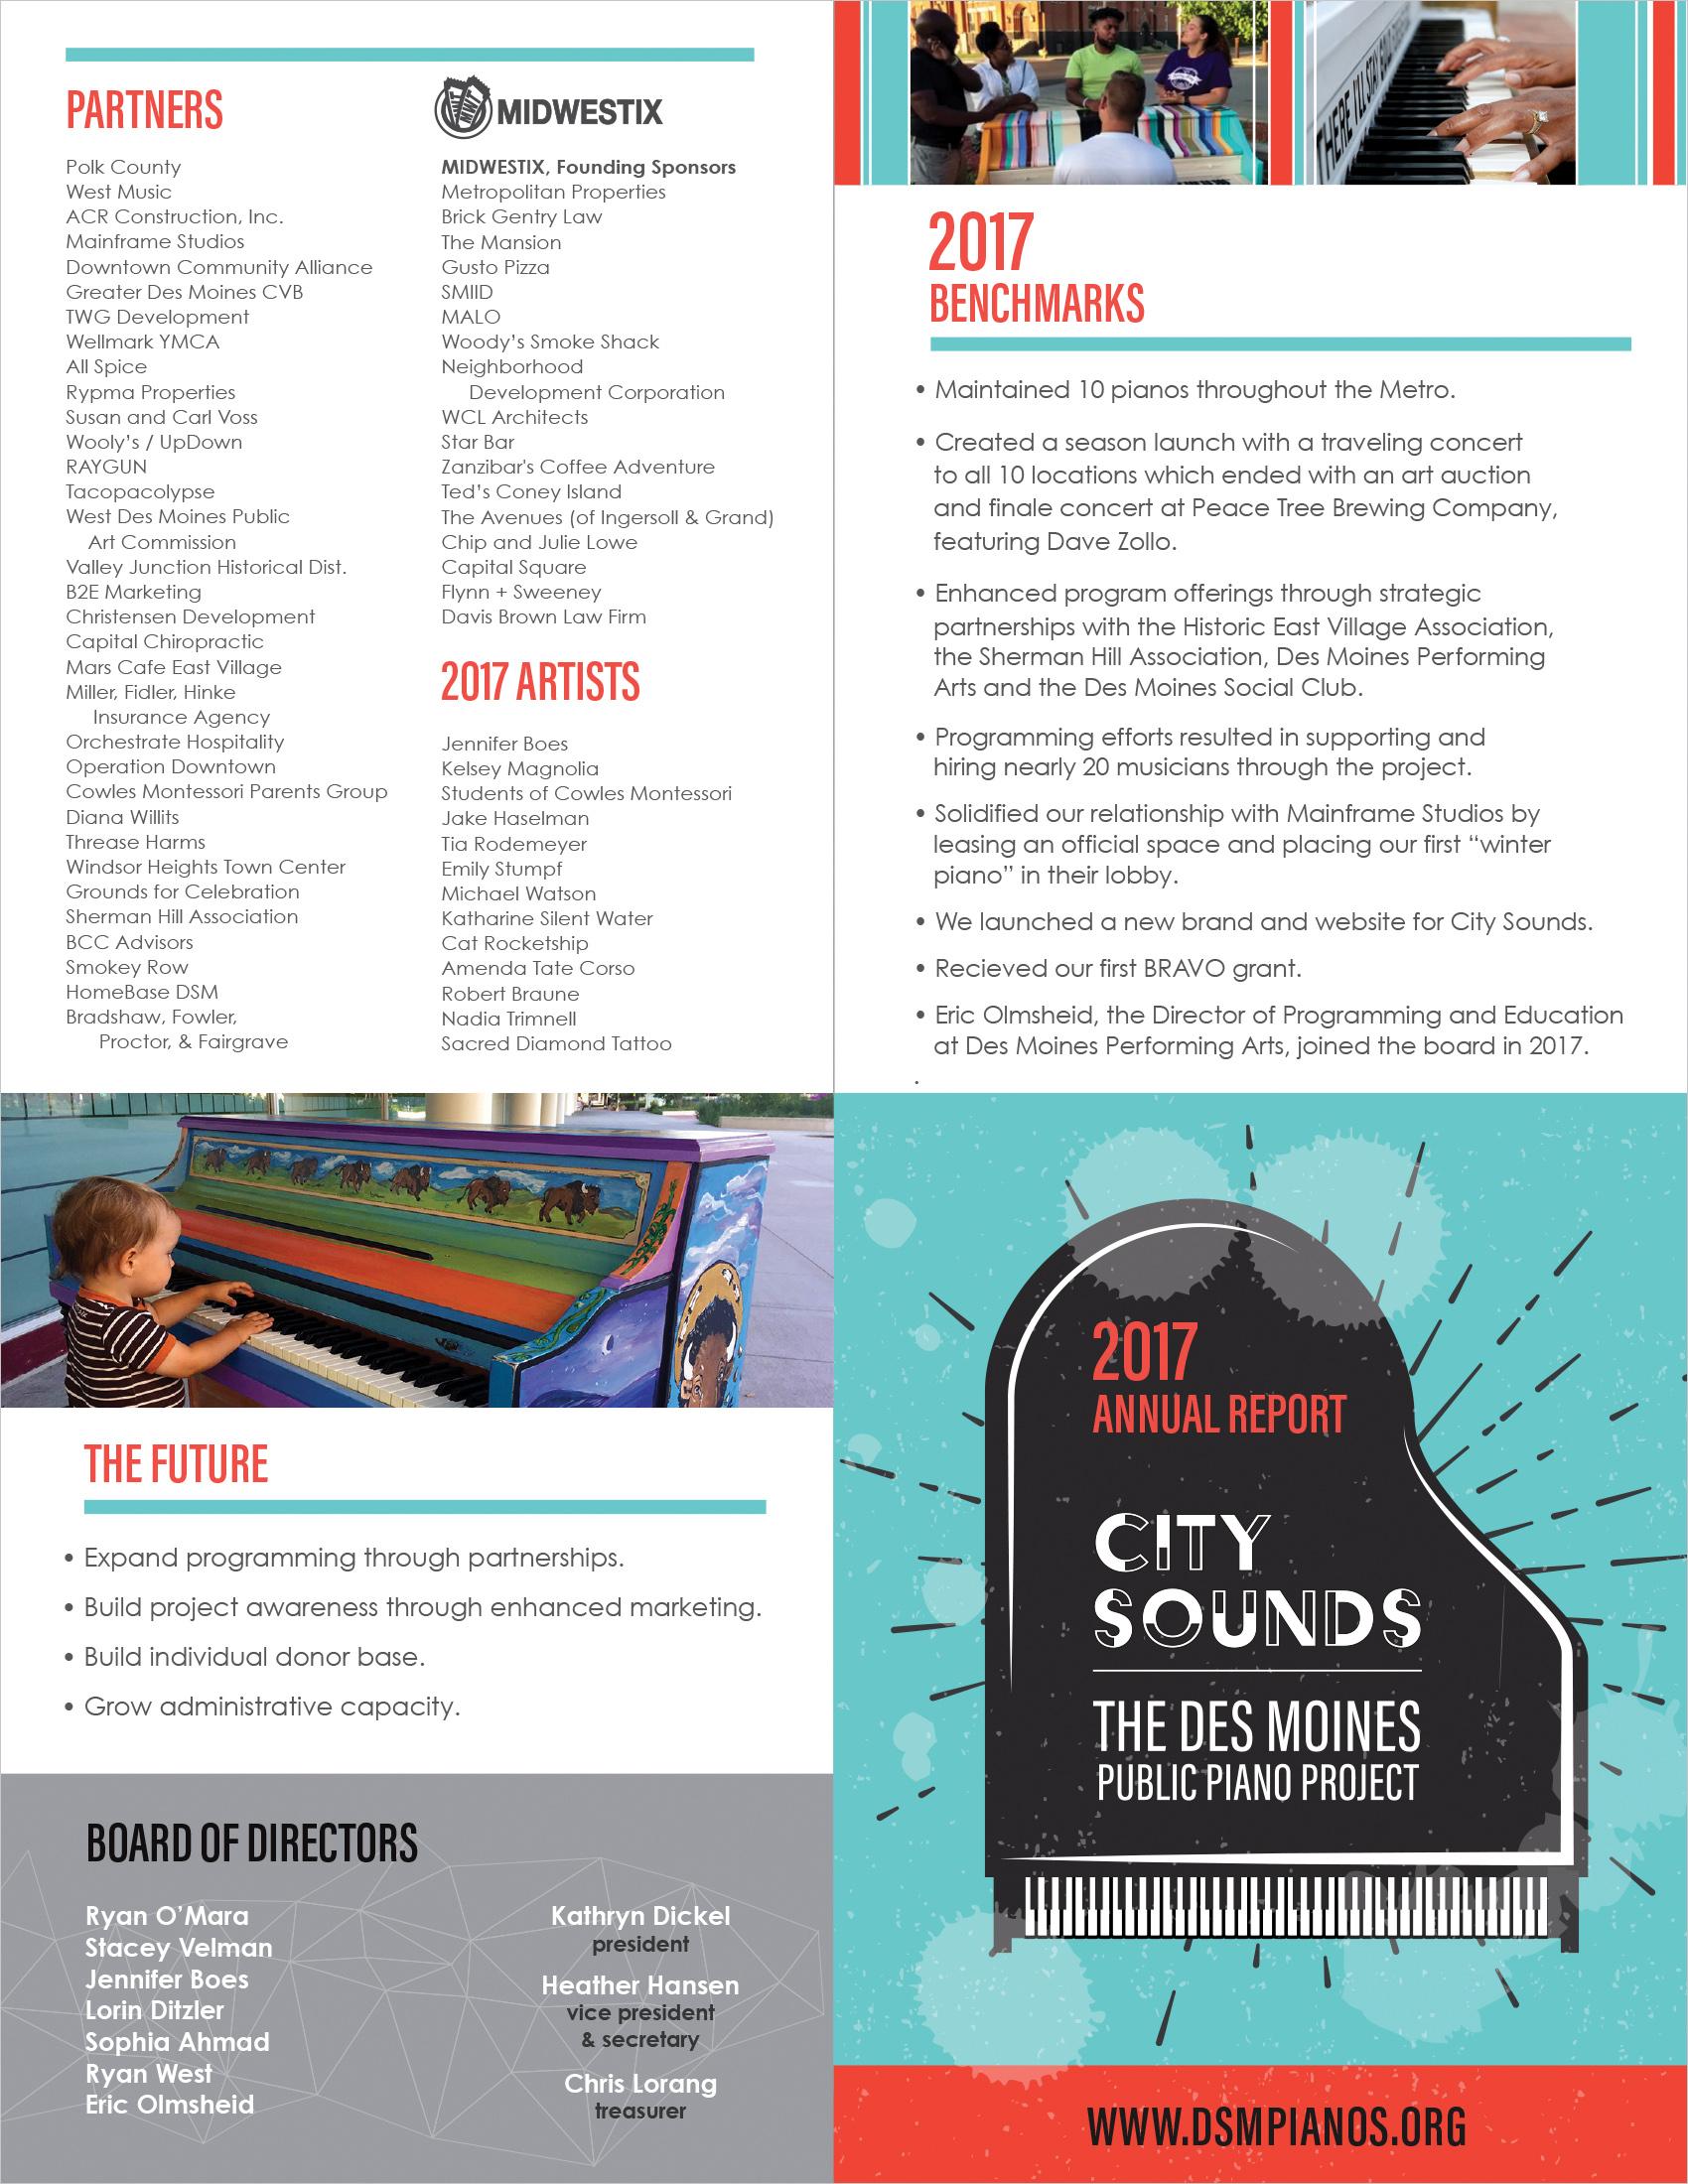 AnnualReport2017front.jpg